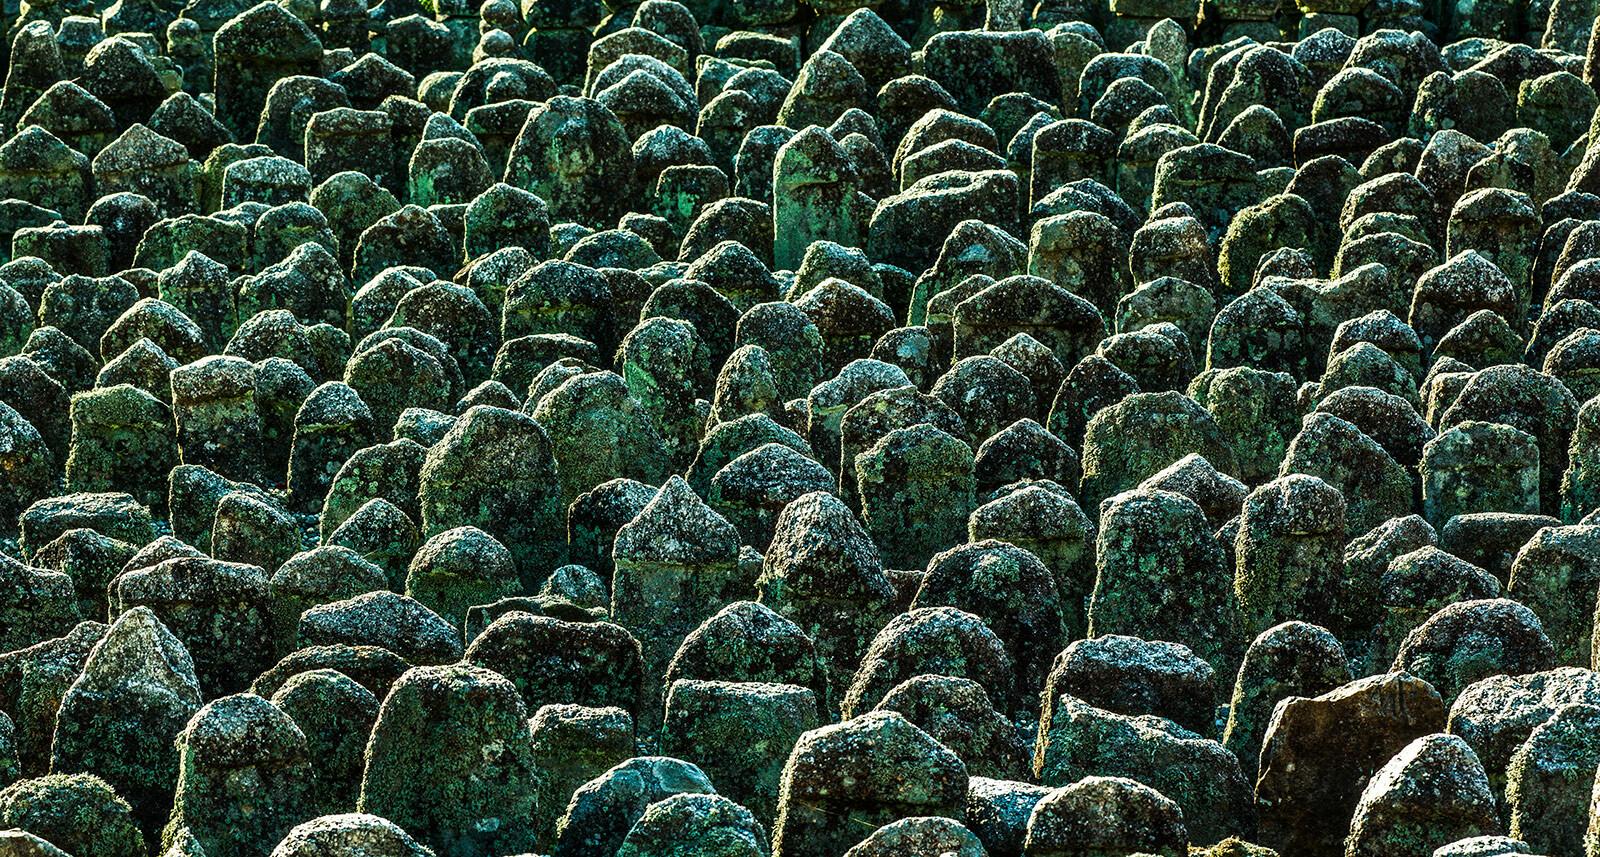 1000 Buddhas - Farin Urlaub